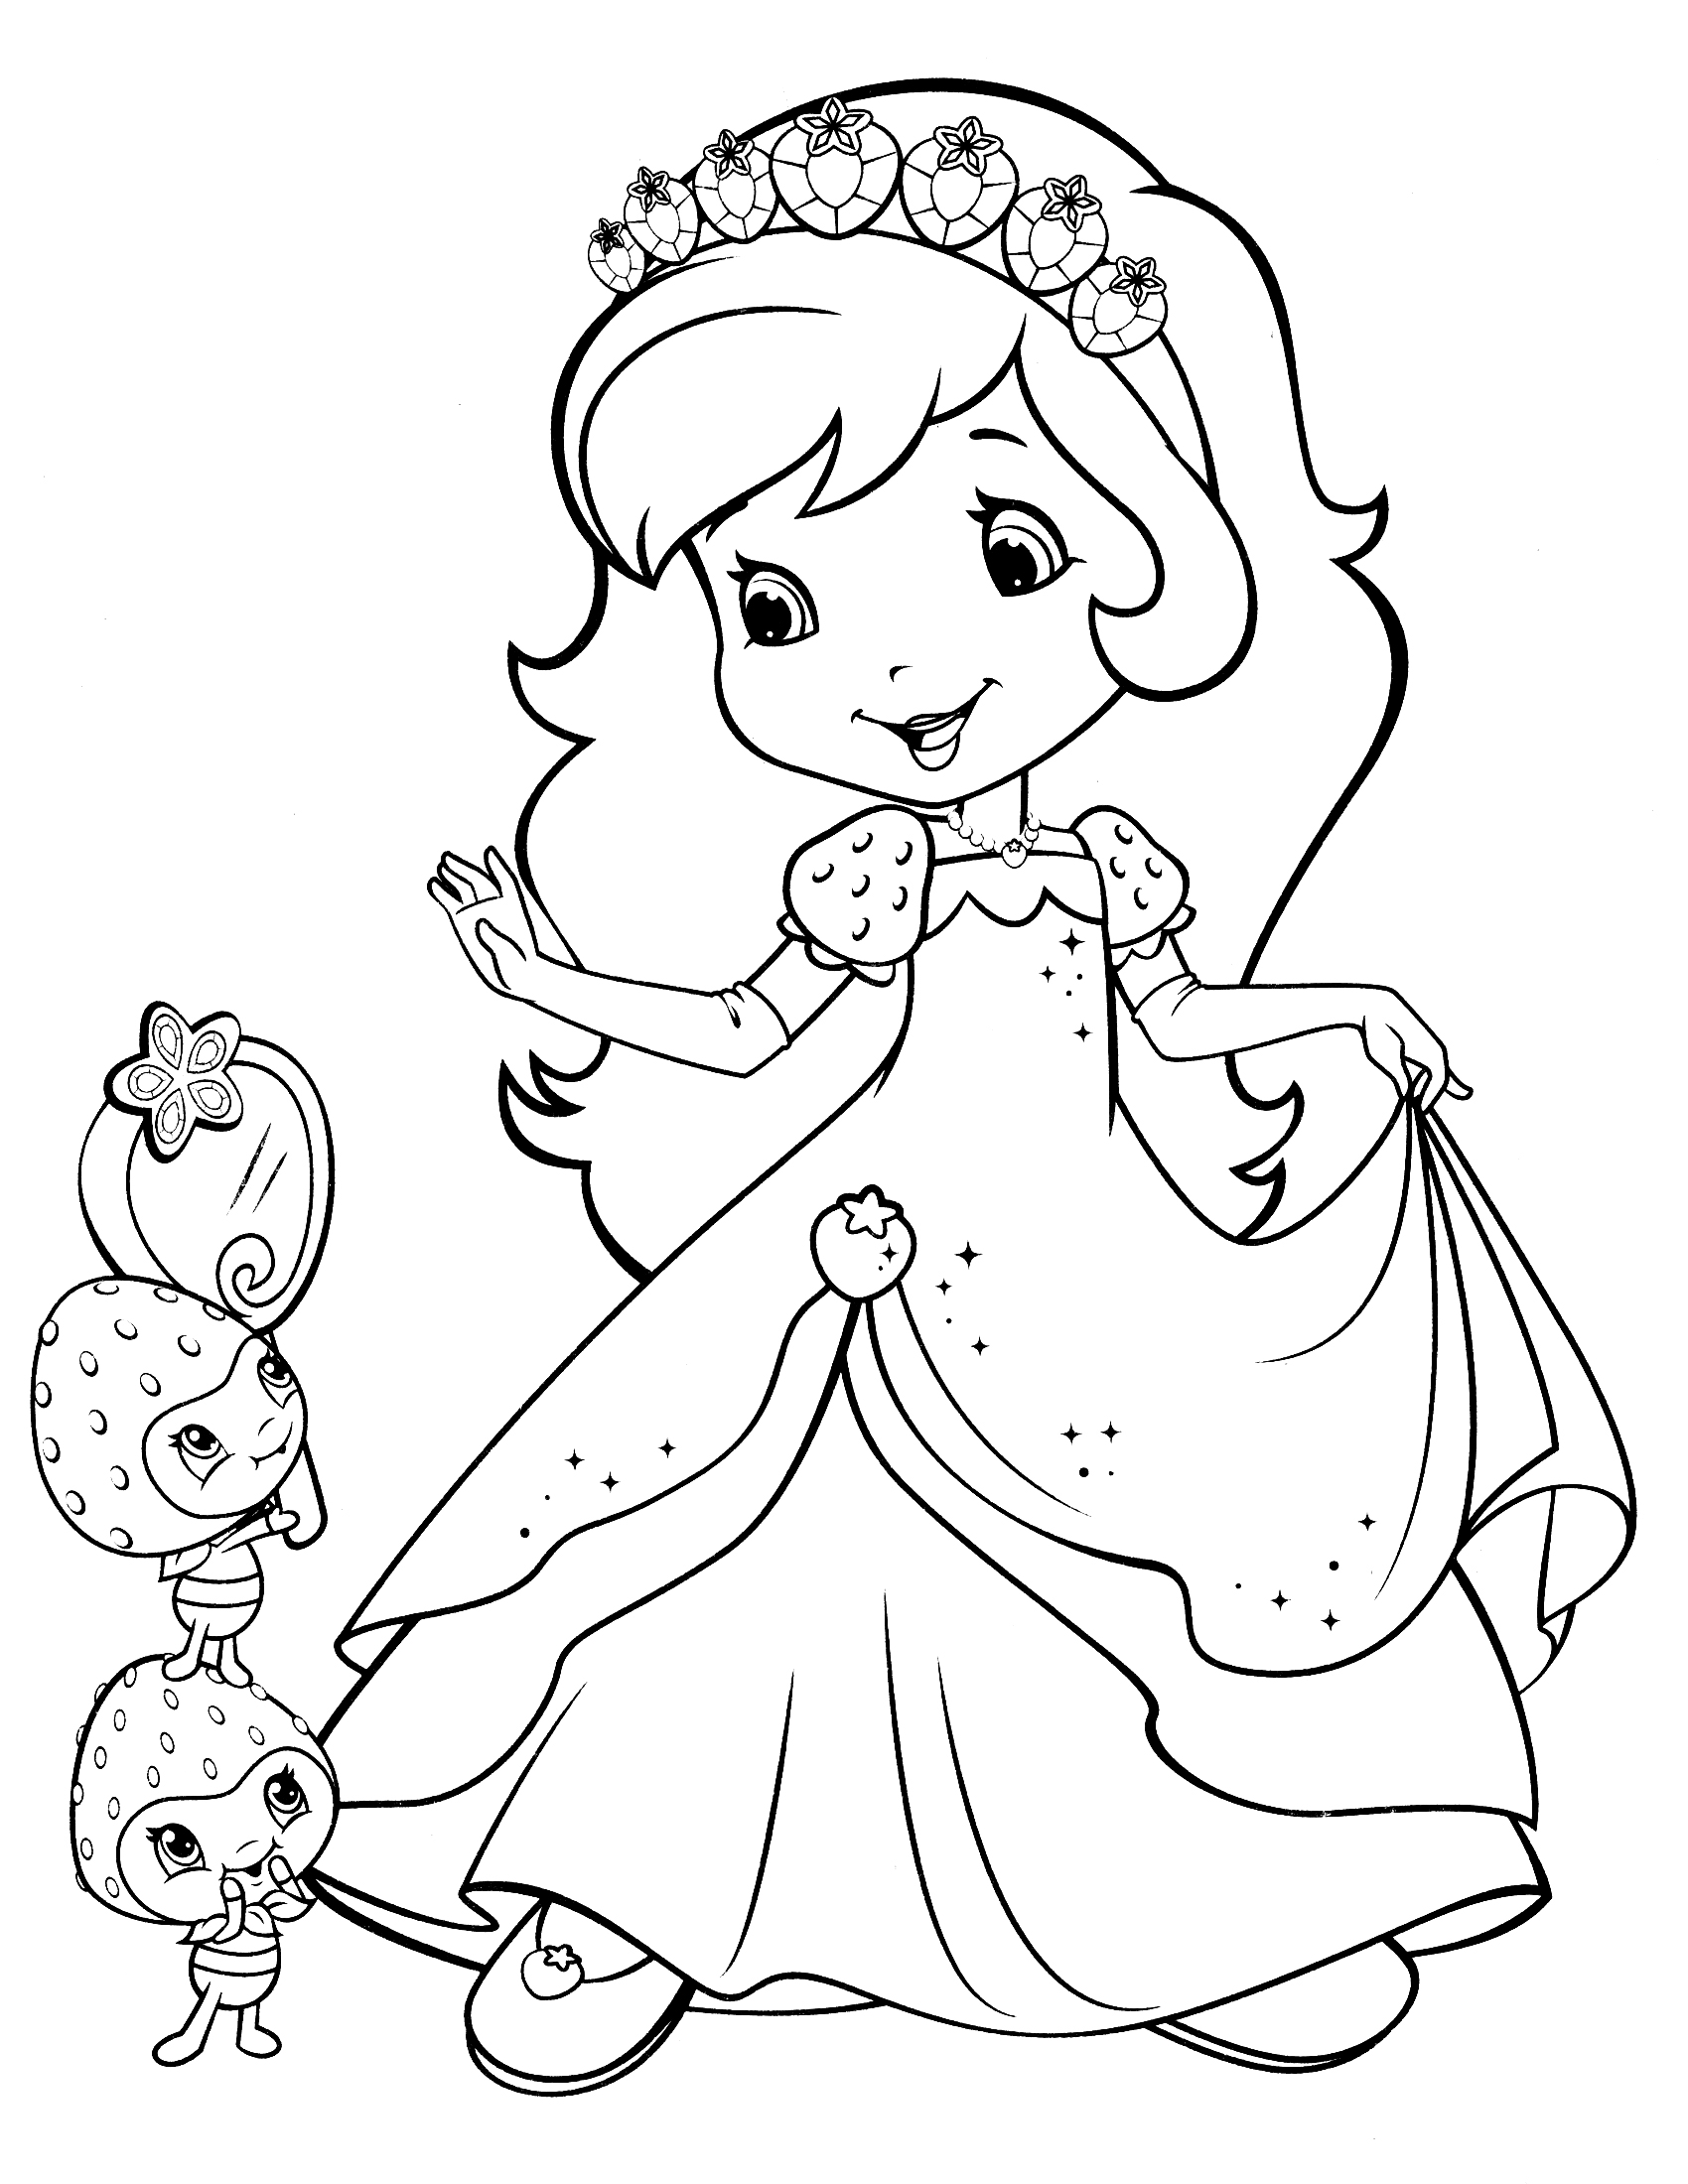 Drawn strawberry cartoon Fresitas page Pinterest strawberry coloring